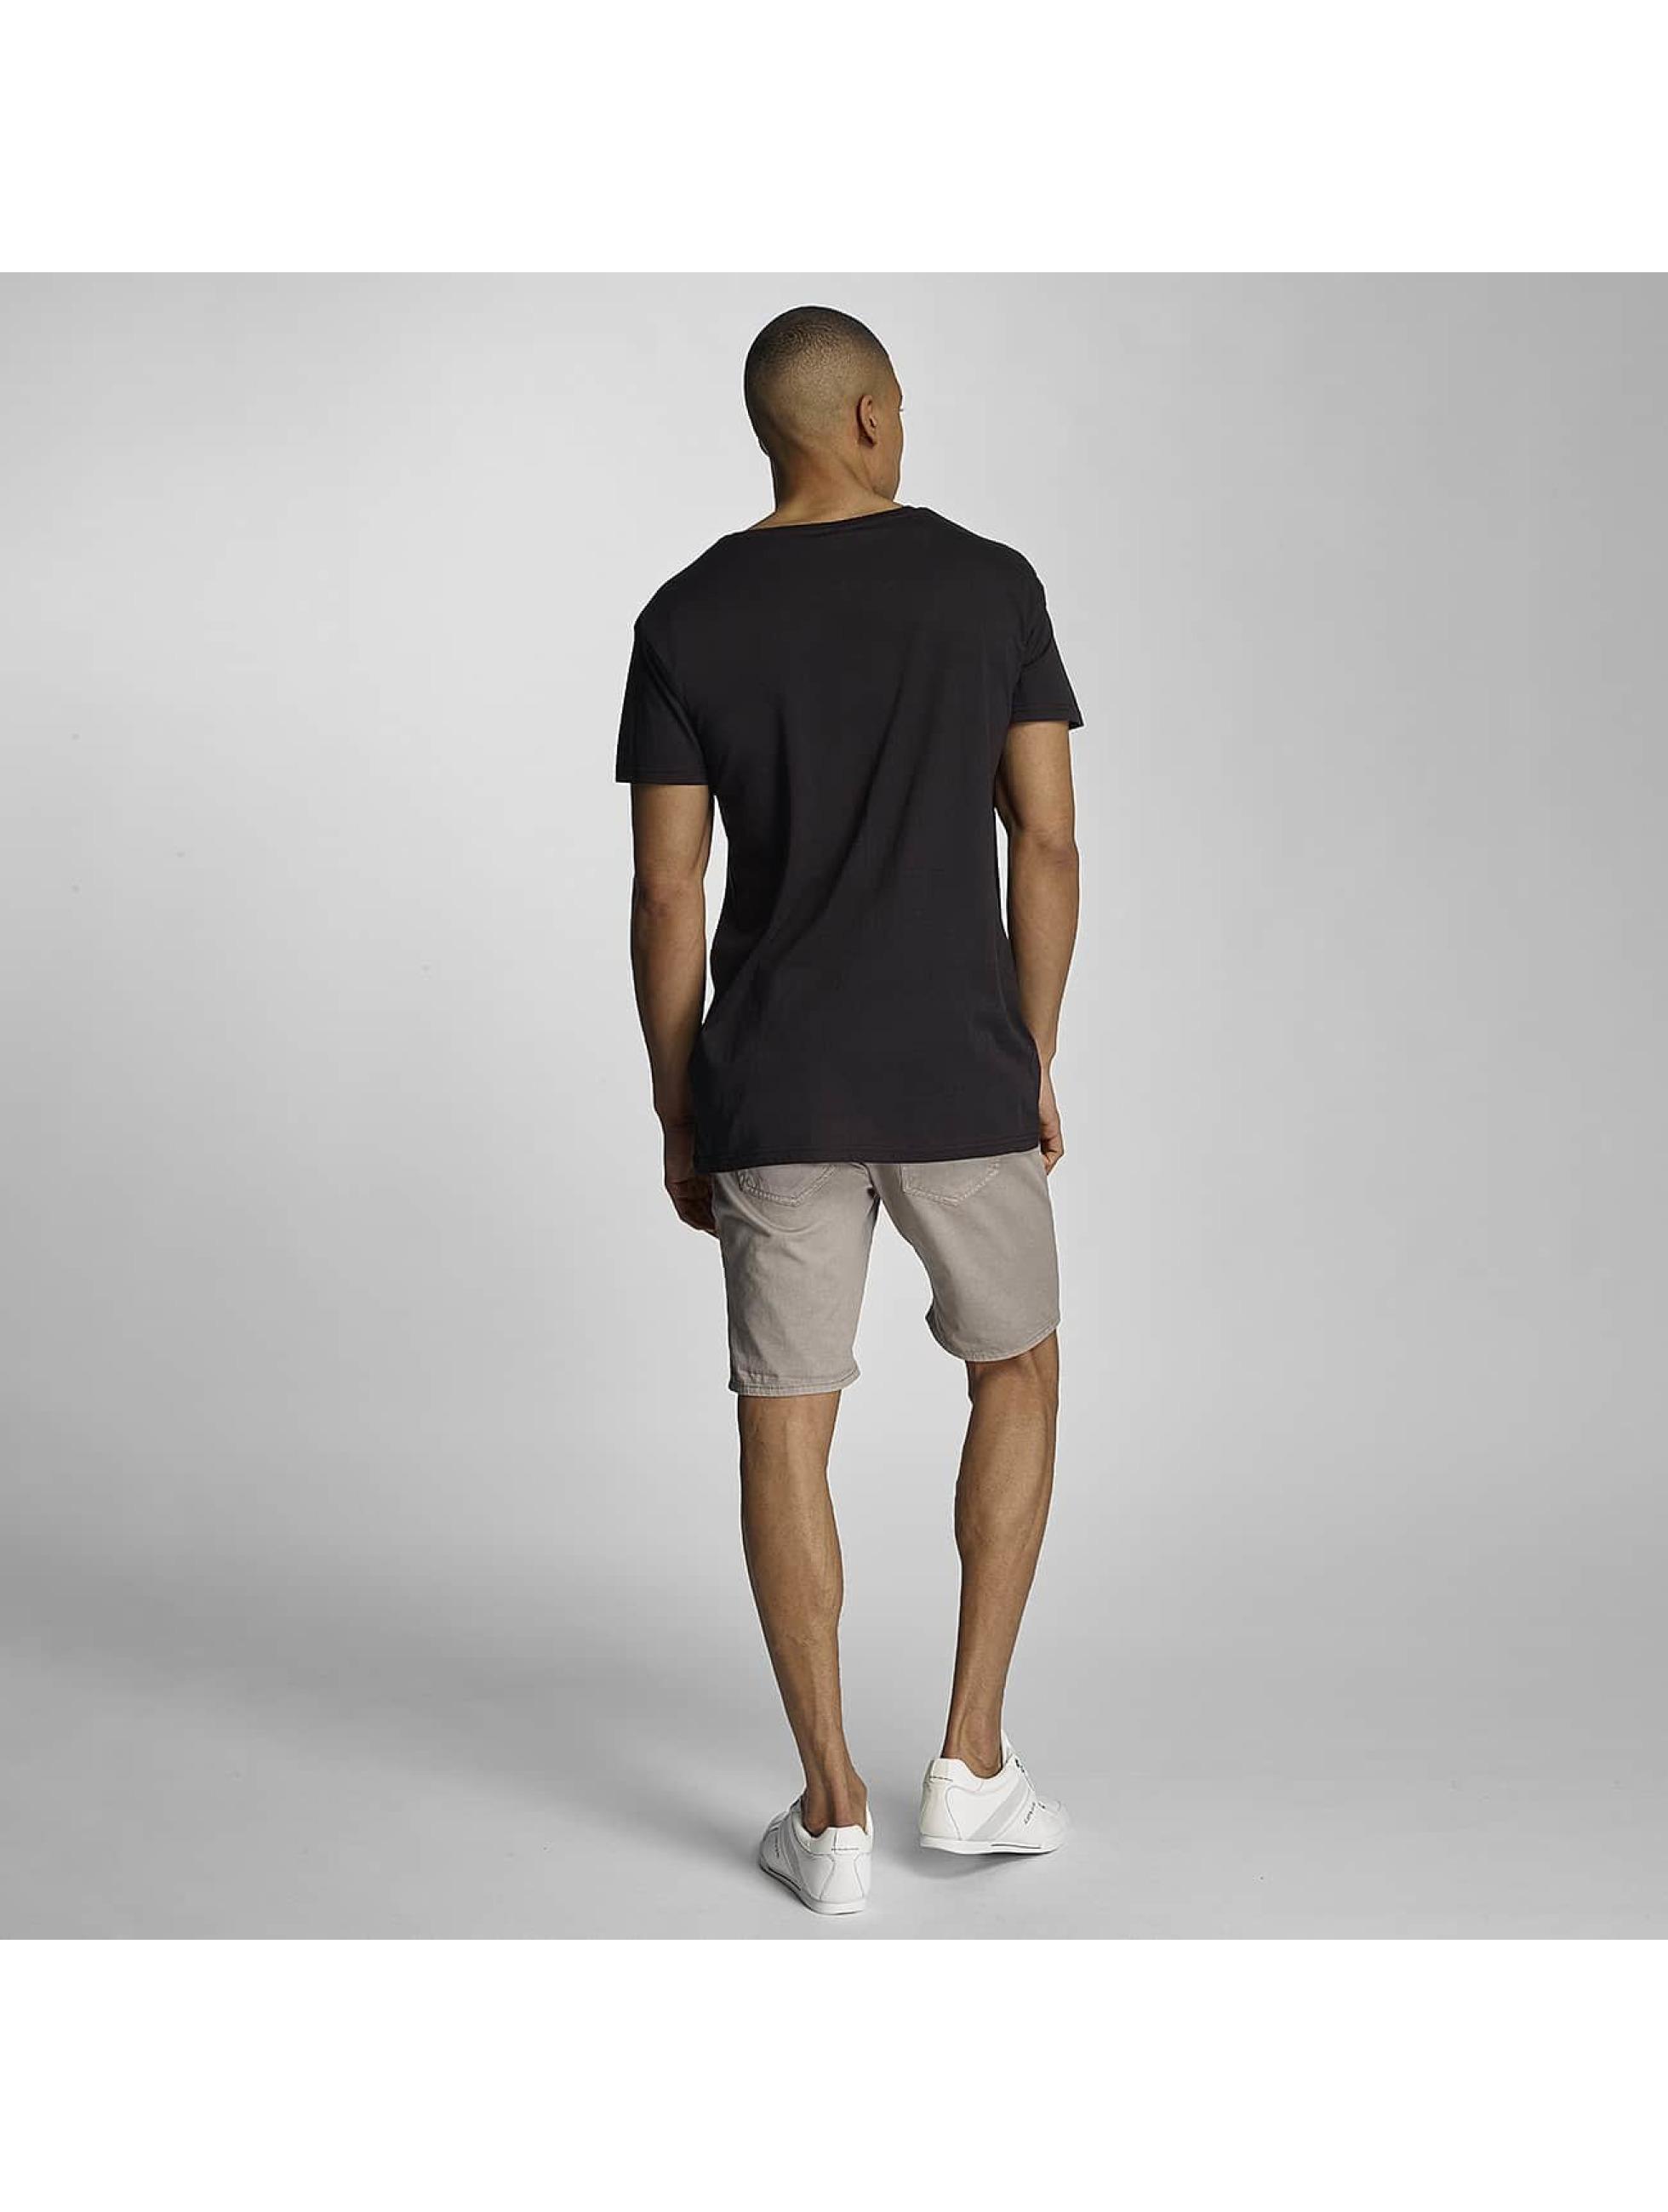 Sublevel T-Shirt like a boss black